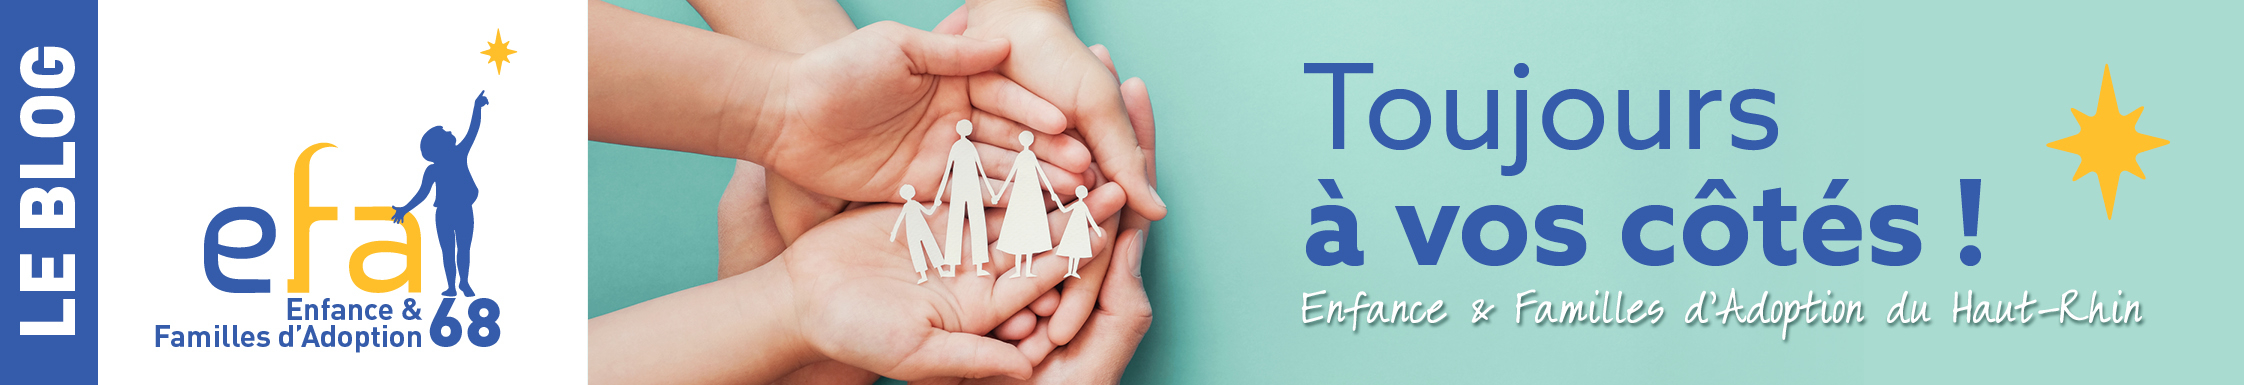 Enfance & Familles d'Adoption 68